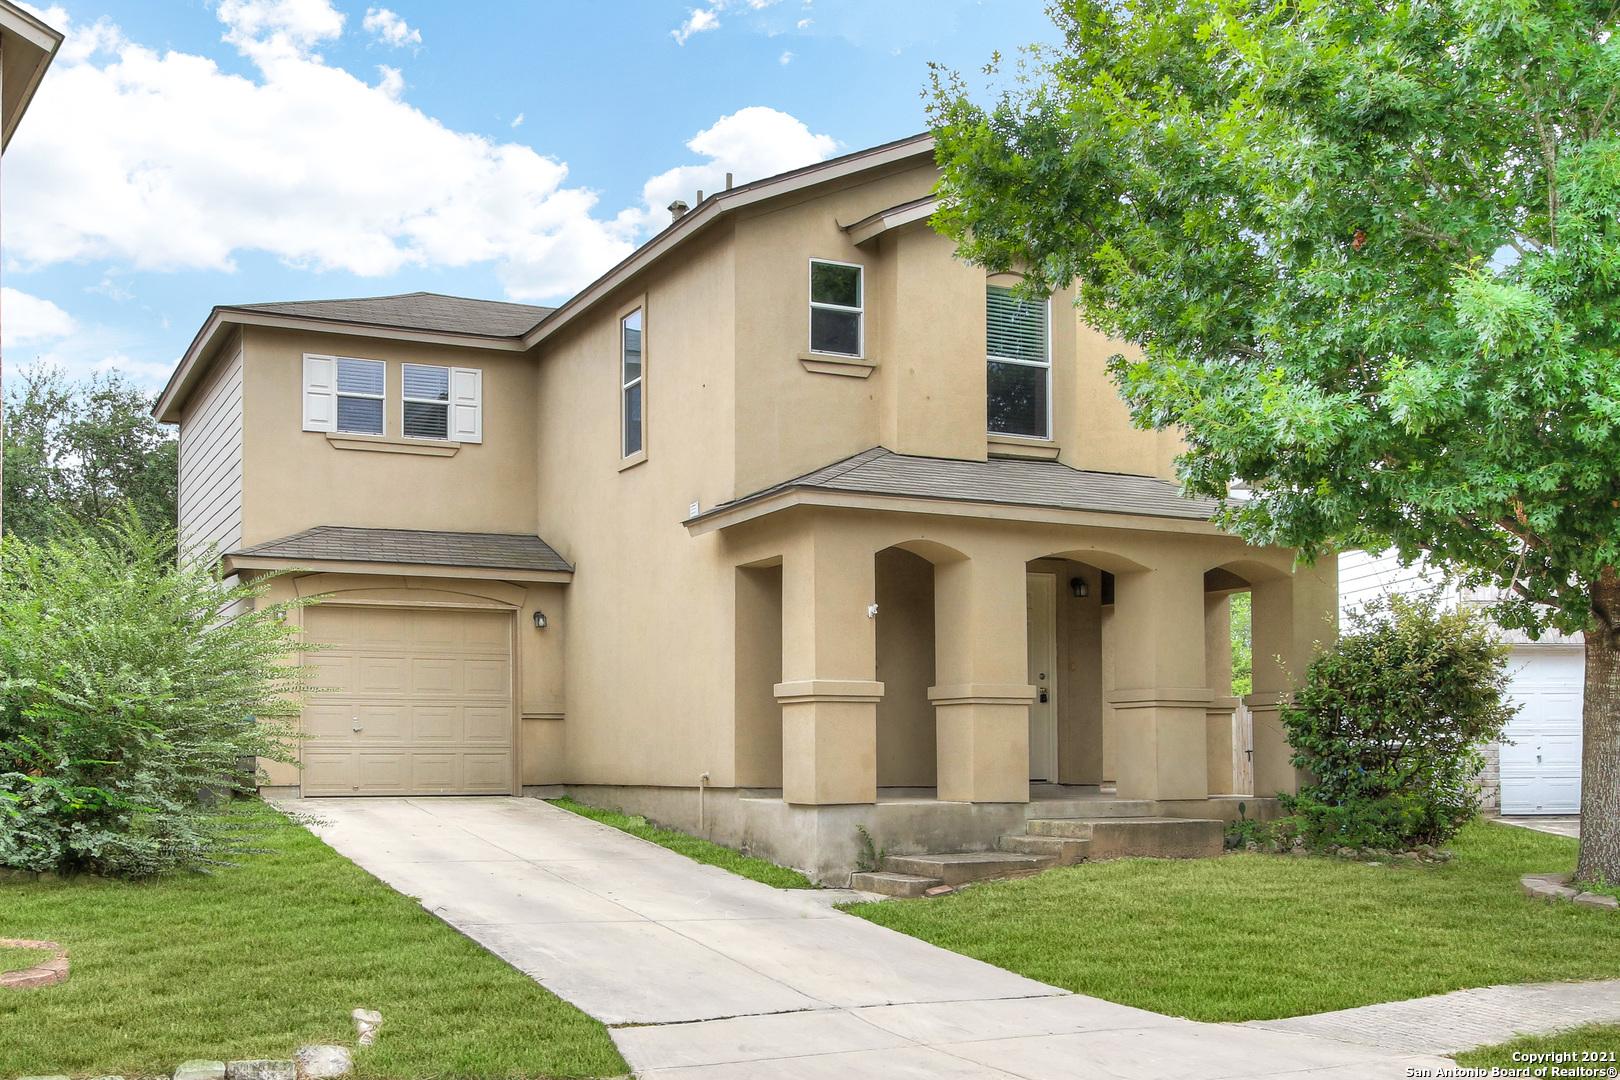 4514 ROXIO DR, San Antonio, TX 78238